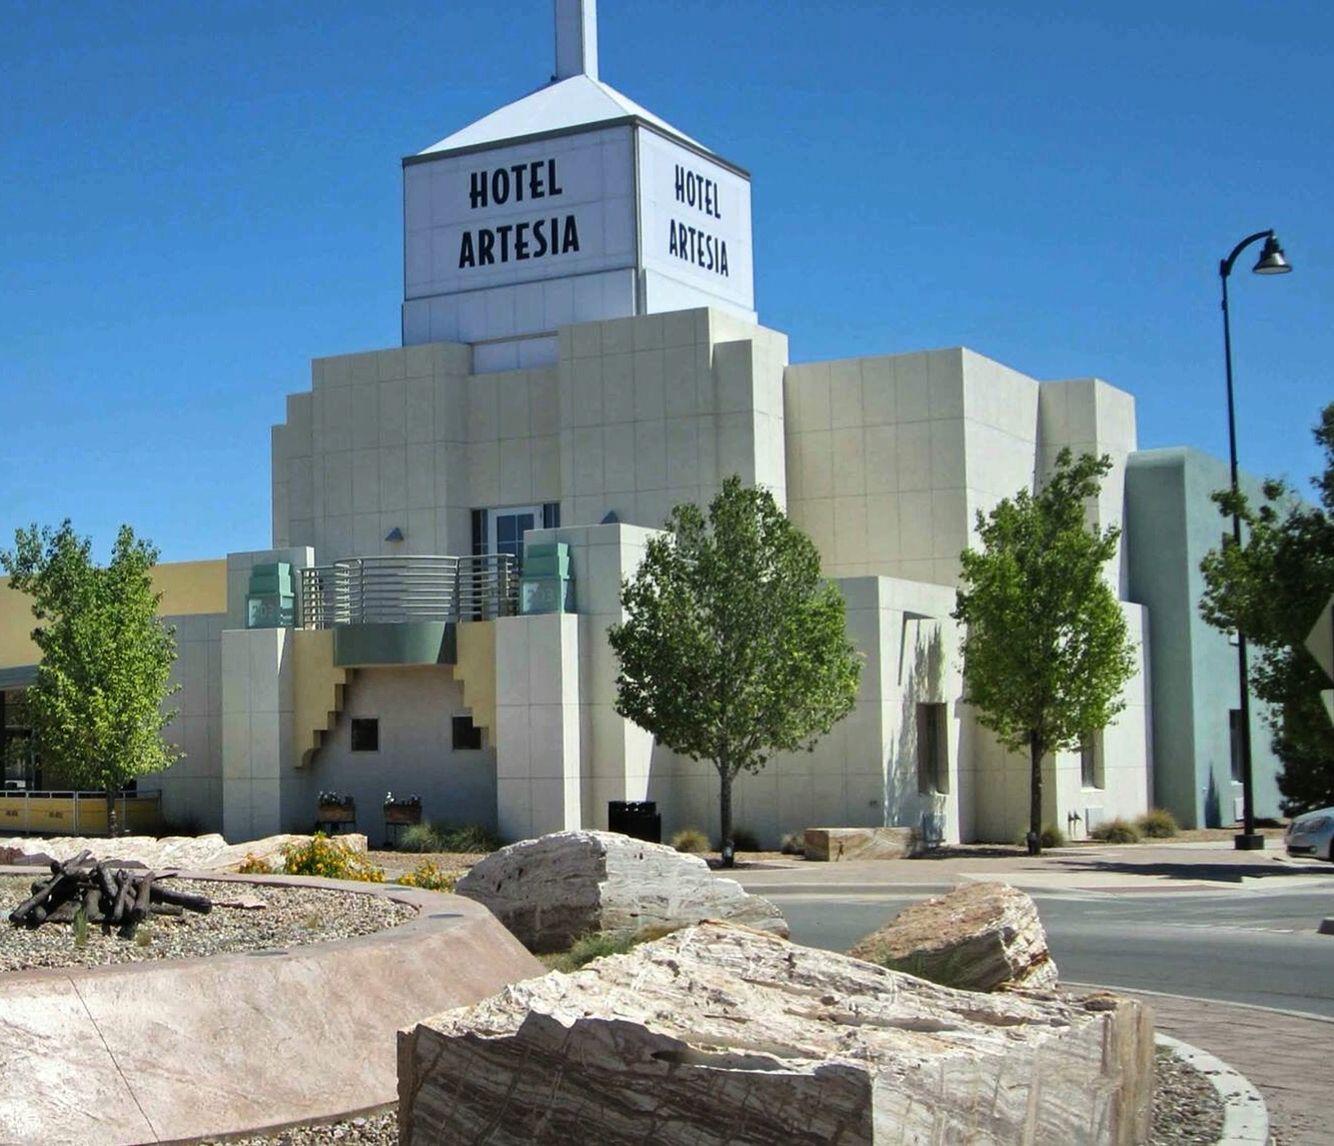 Hotel Artesia, New Mexico, Reid & Associates, 2009 ...